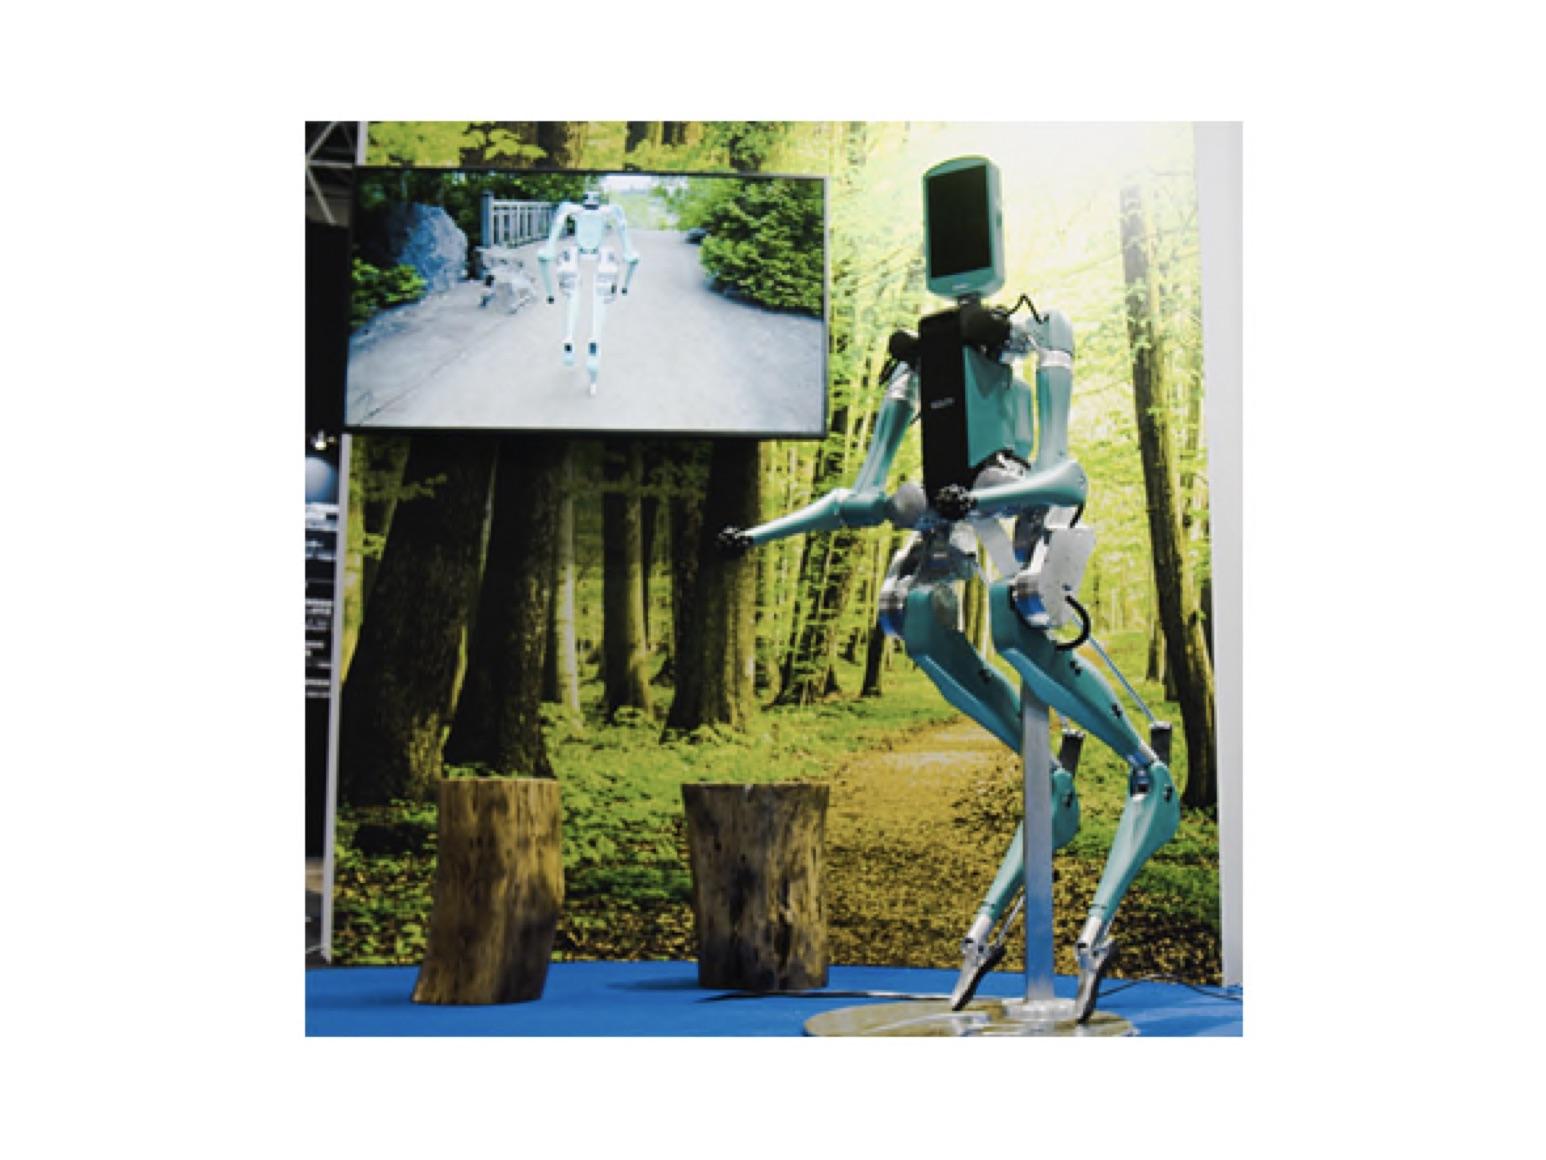 ANAホールディングス、二足歩行ロボットの技術を持つ米国スタートアップ「Agility Robotics」と提携